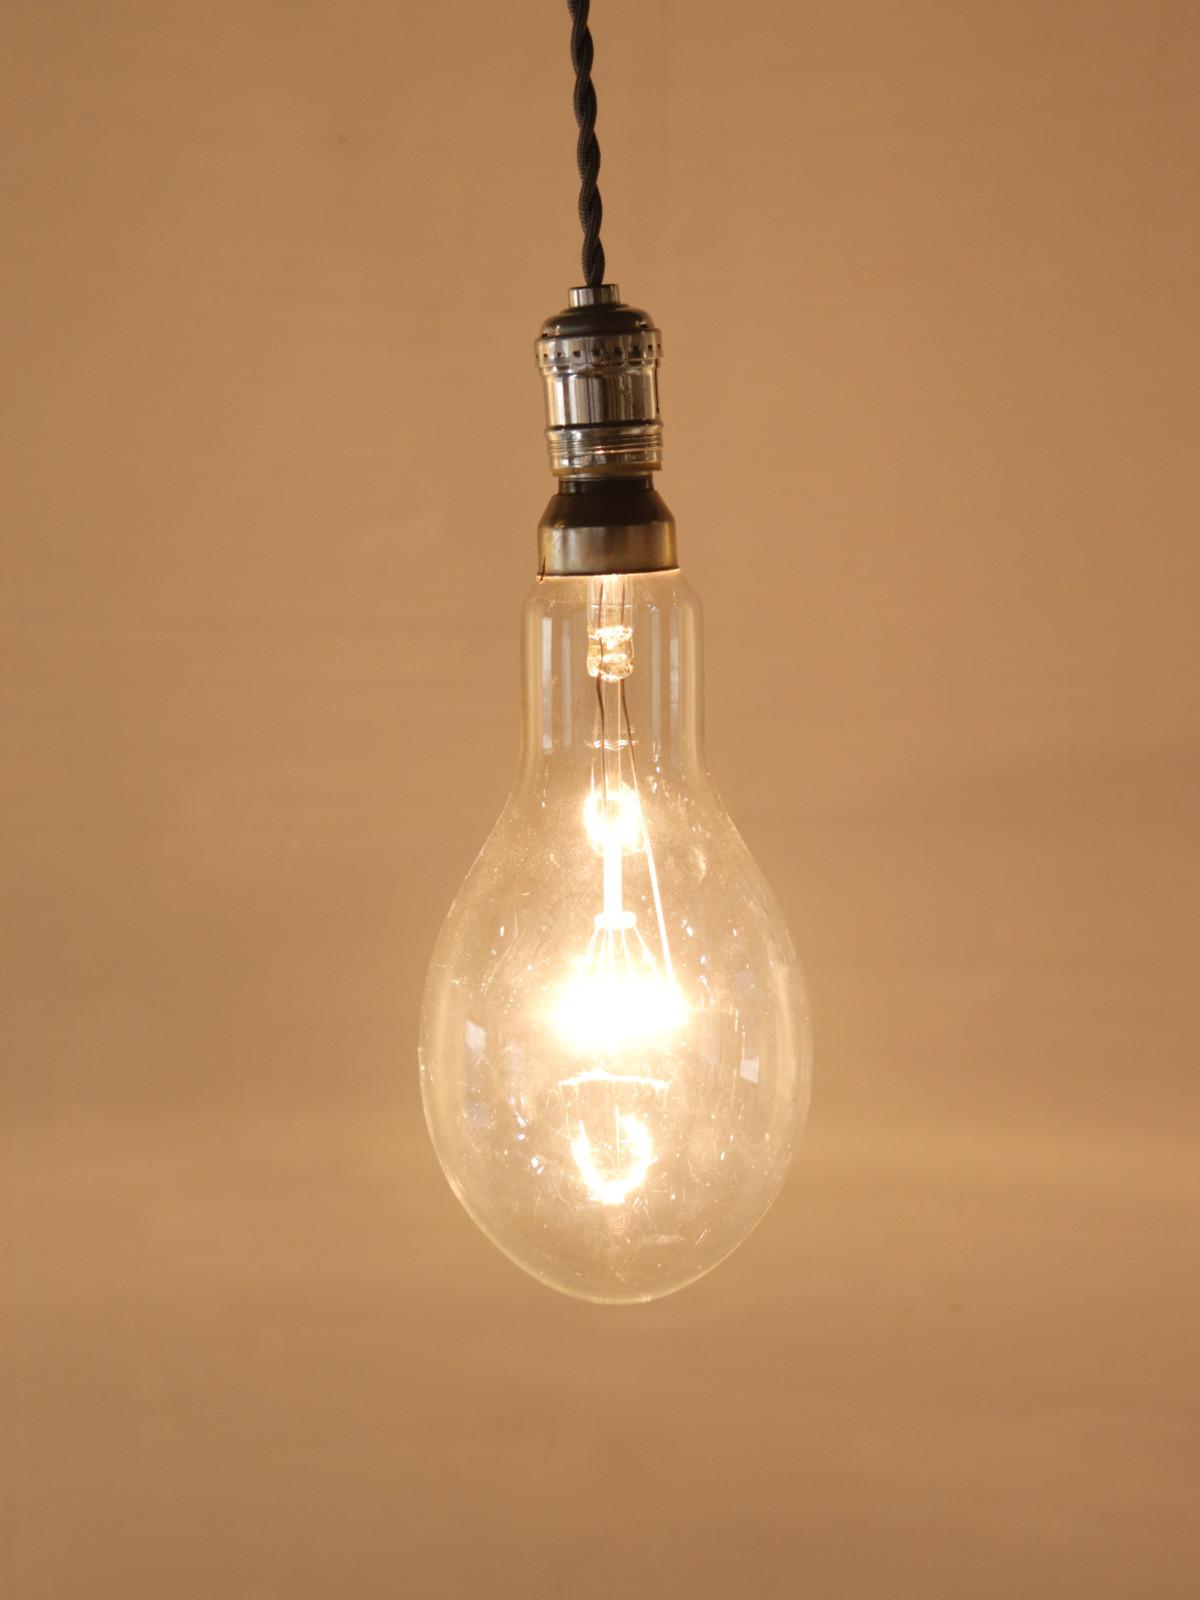 nickel plated,lamp,usa,vintage